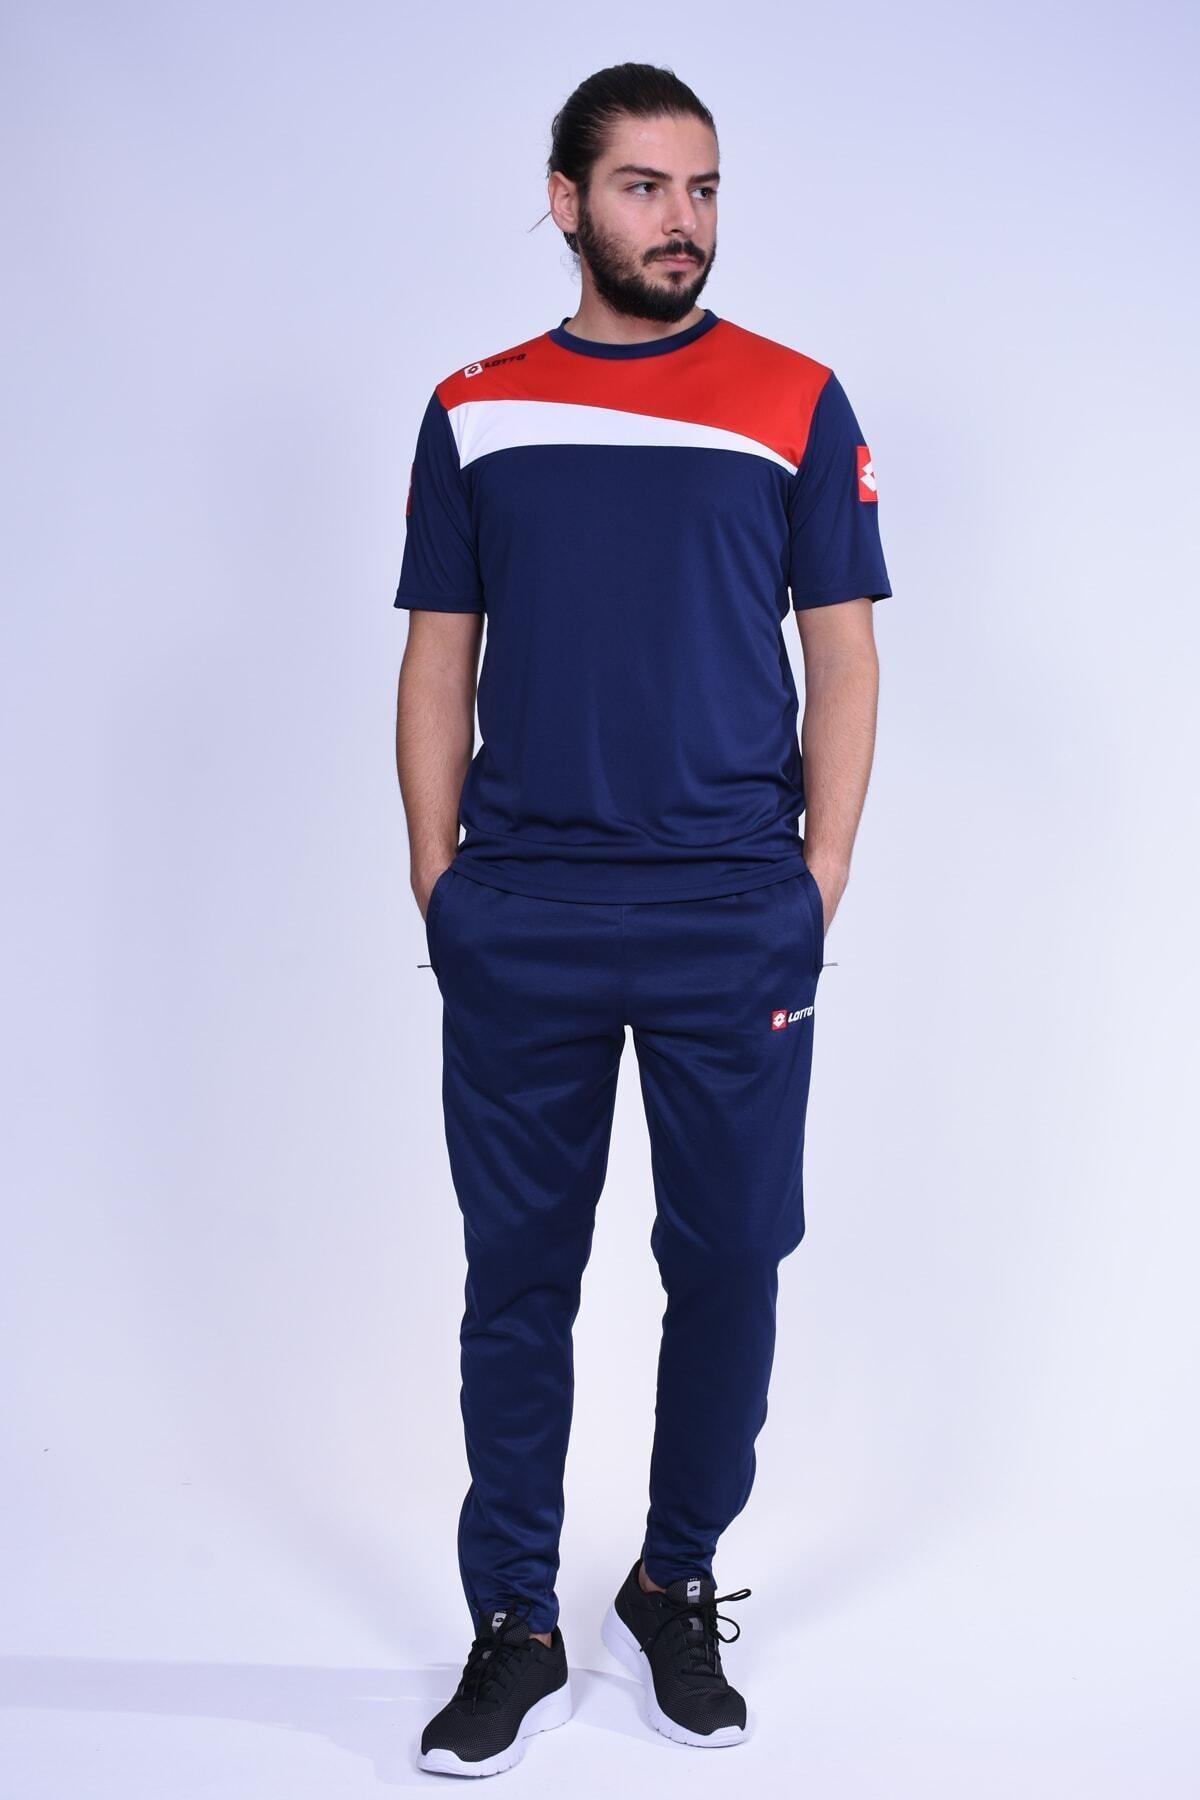 Erkek- T-shirt - Truro Tee Antr Pl - R7117 - Lacivert-kırmızı